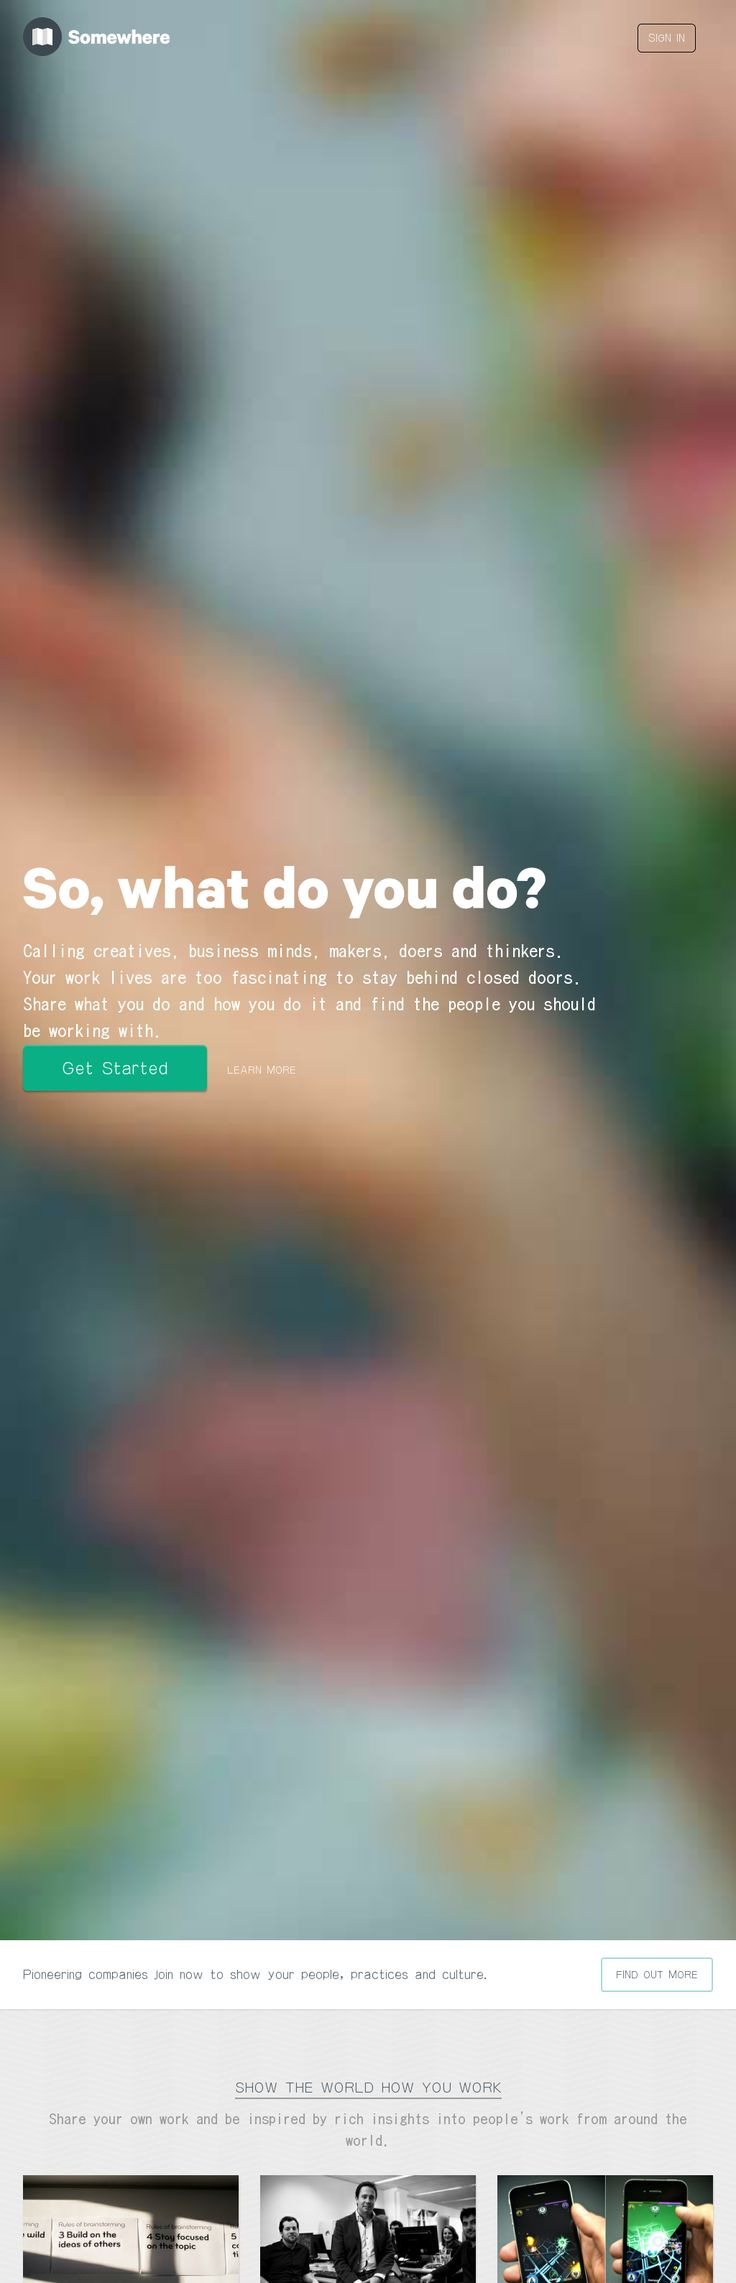 Flat web design with blurred background image. Nice design! Web Design #WebDesign #design #UI #UX #identity #website #SiteDesign #awesome #UserInterface #communication #VisualCommunication